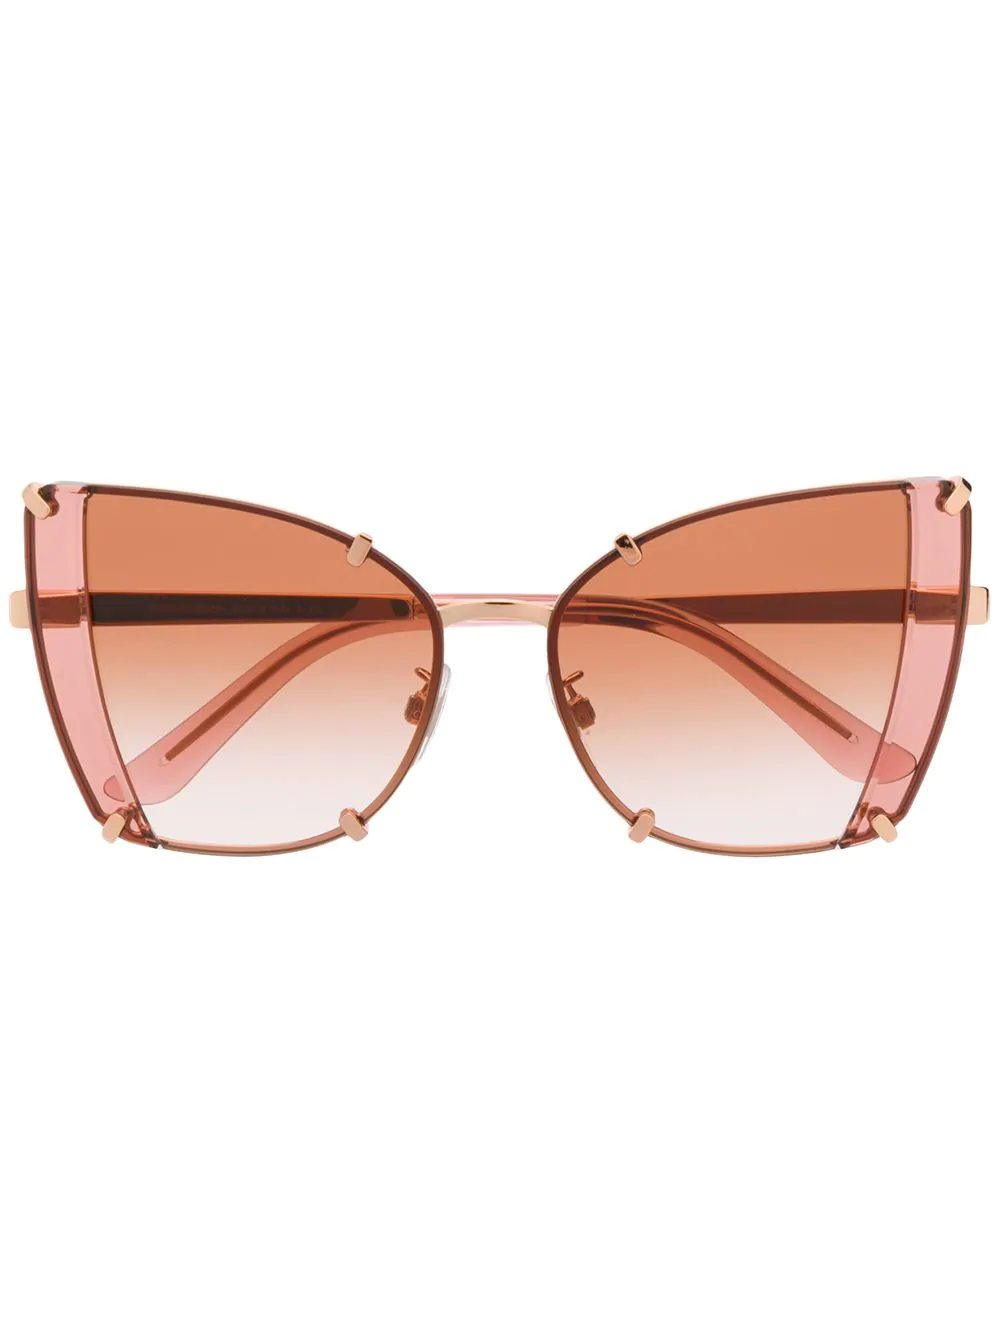 e94ff8f7275 Dolce   Gabbana Eyewear Faceted Butterfly Sunglasses - Pink